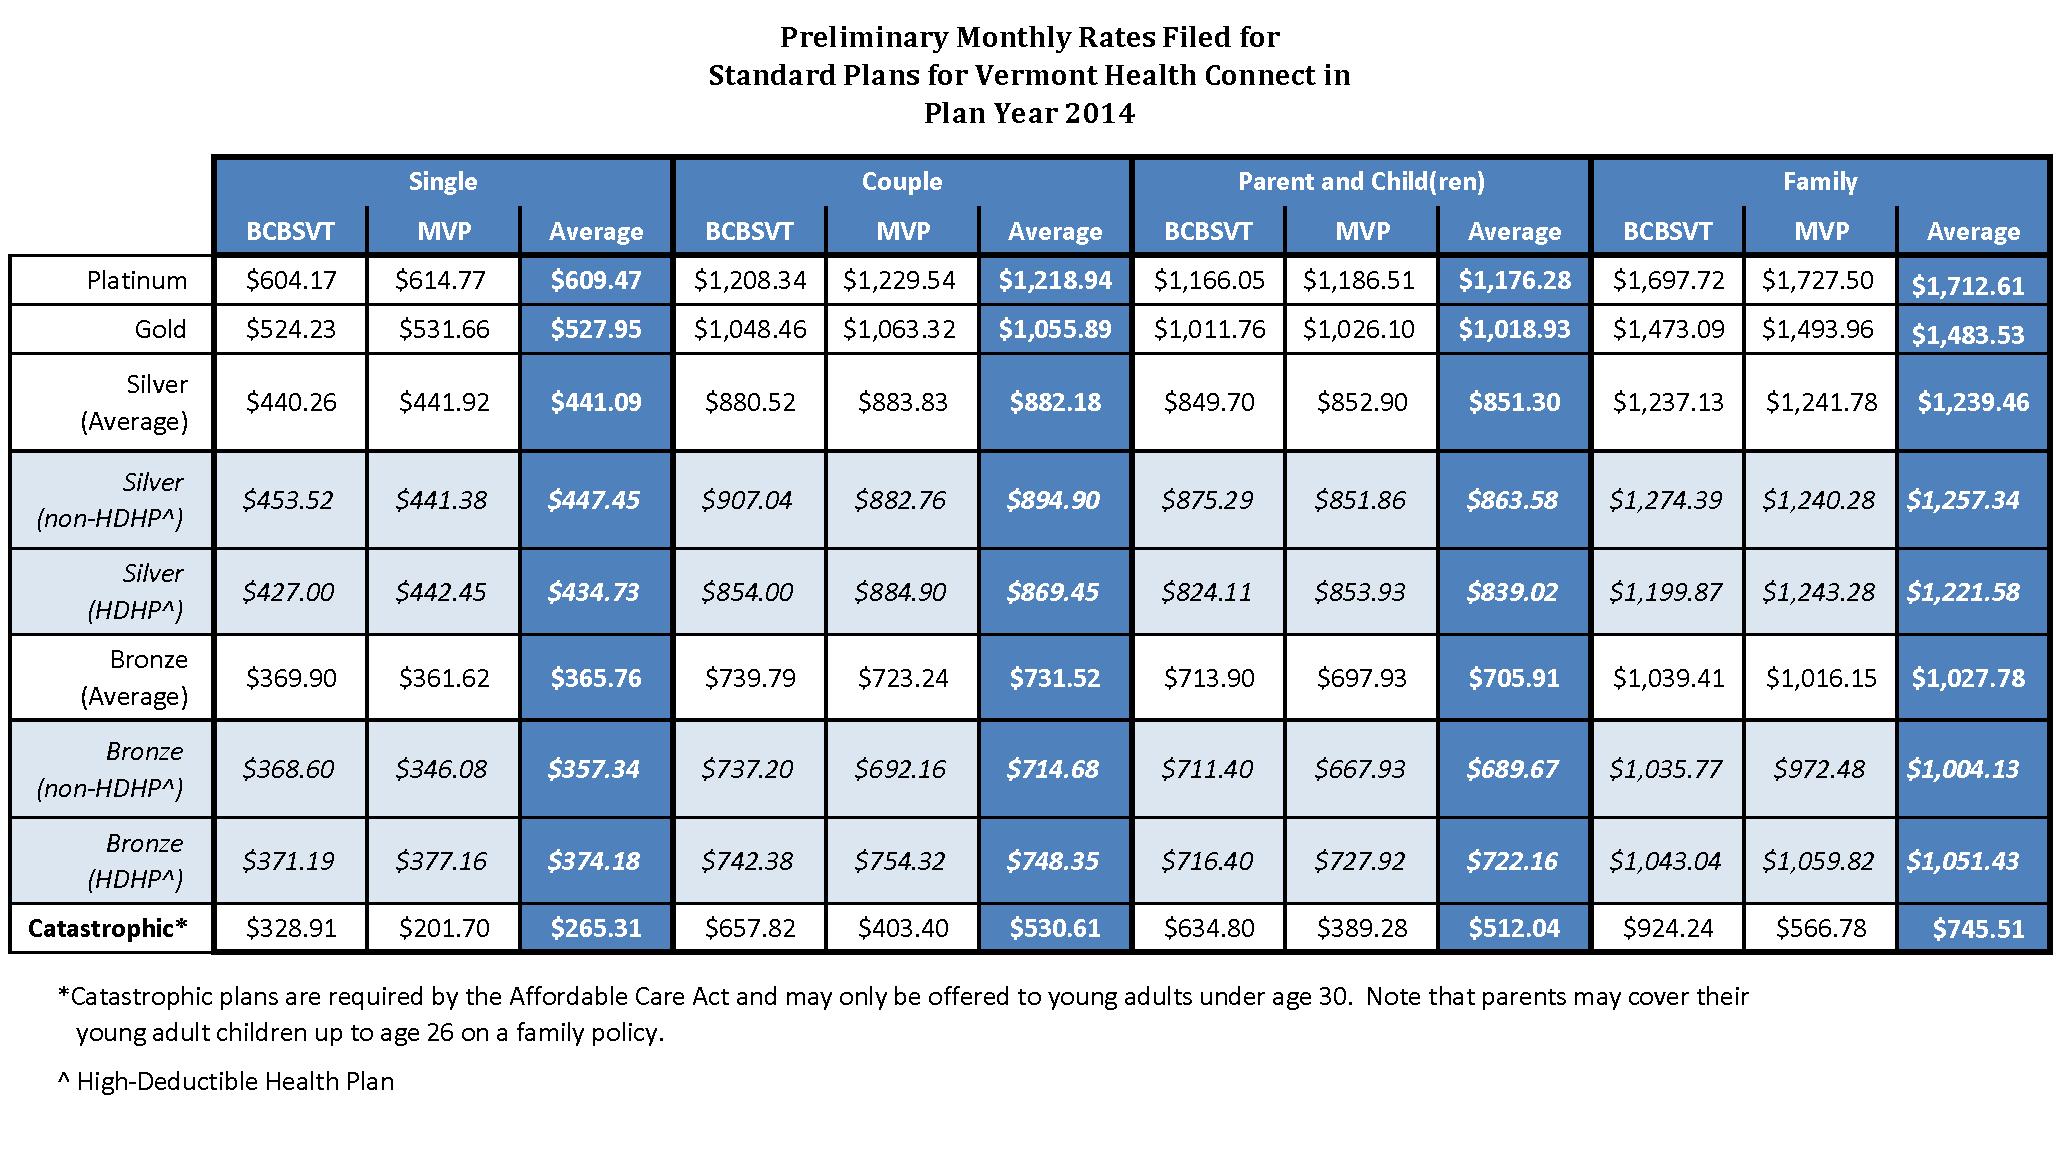 Insurance Comparison Spreadsheet Template For Health Insurance Comparison Spreadsheet And Health Insurance Parison